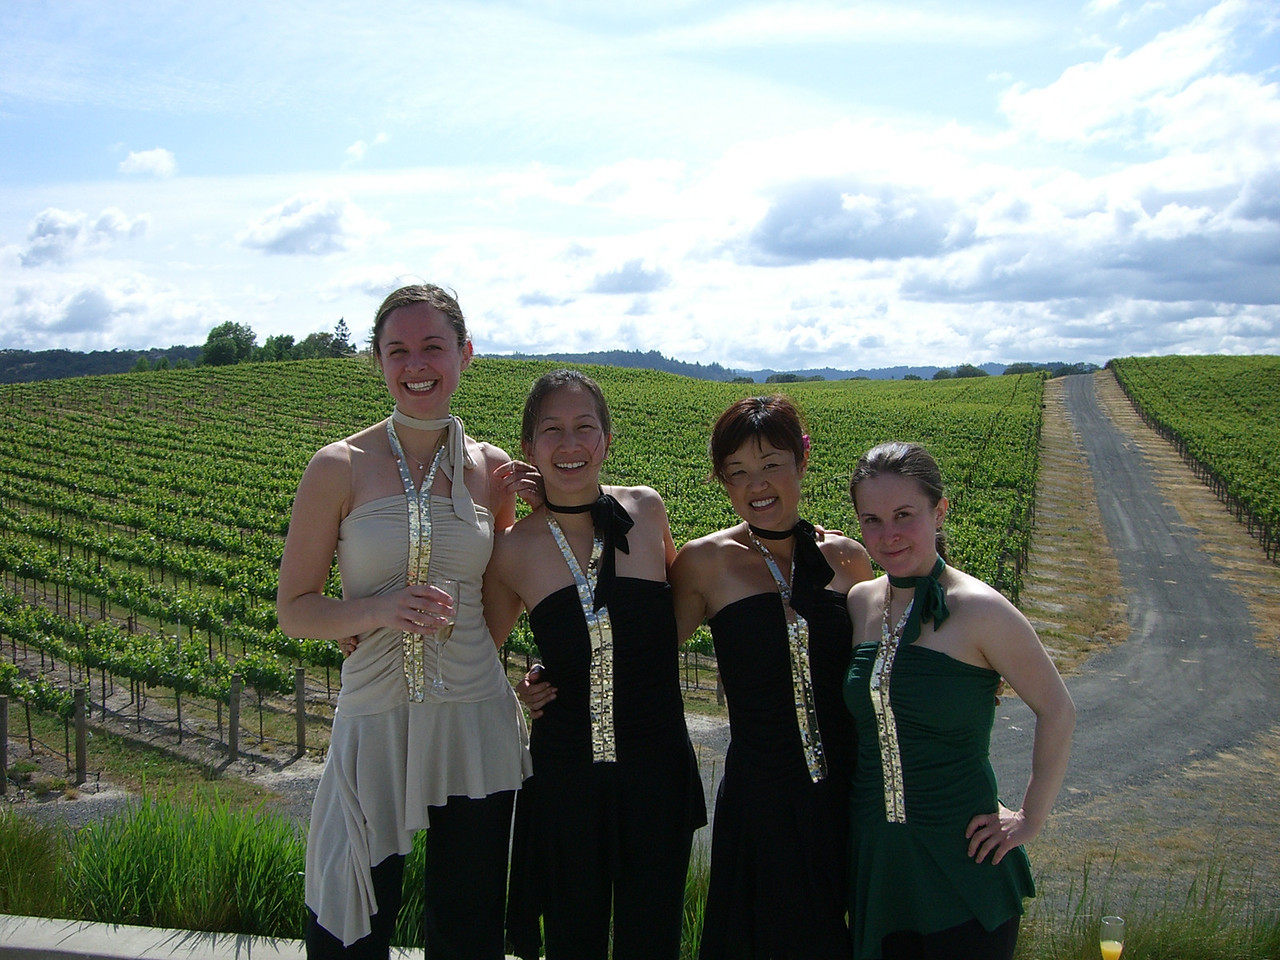 2006 05 20 Sat - Ladies & Grapes - Sarah Palethorpe, Evonne Chiu, Yon Na, & Jeanne Guzzetta